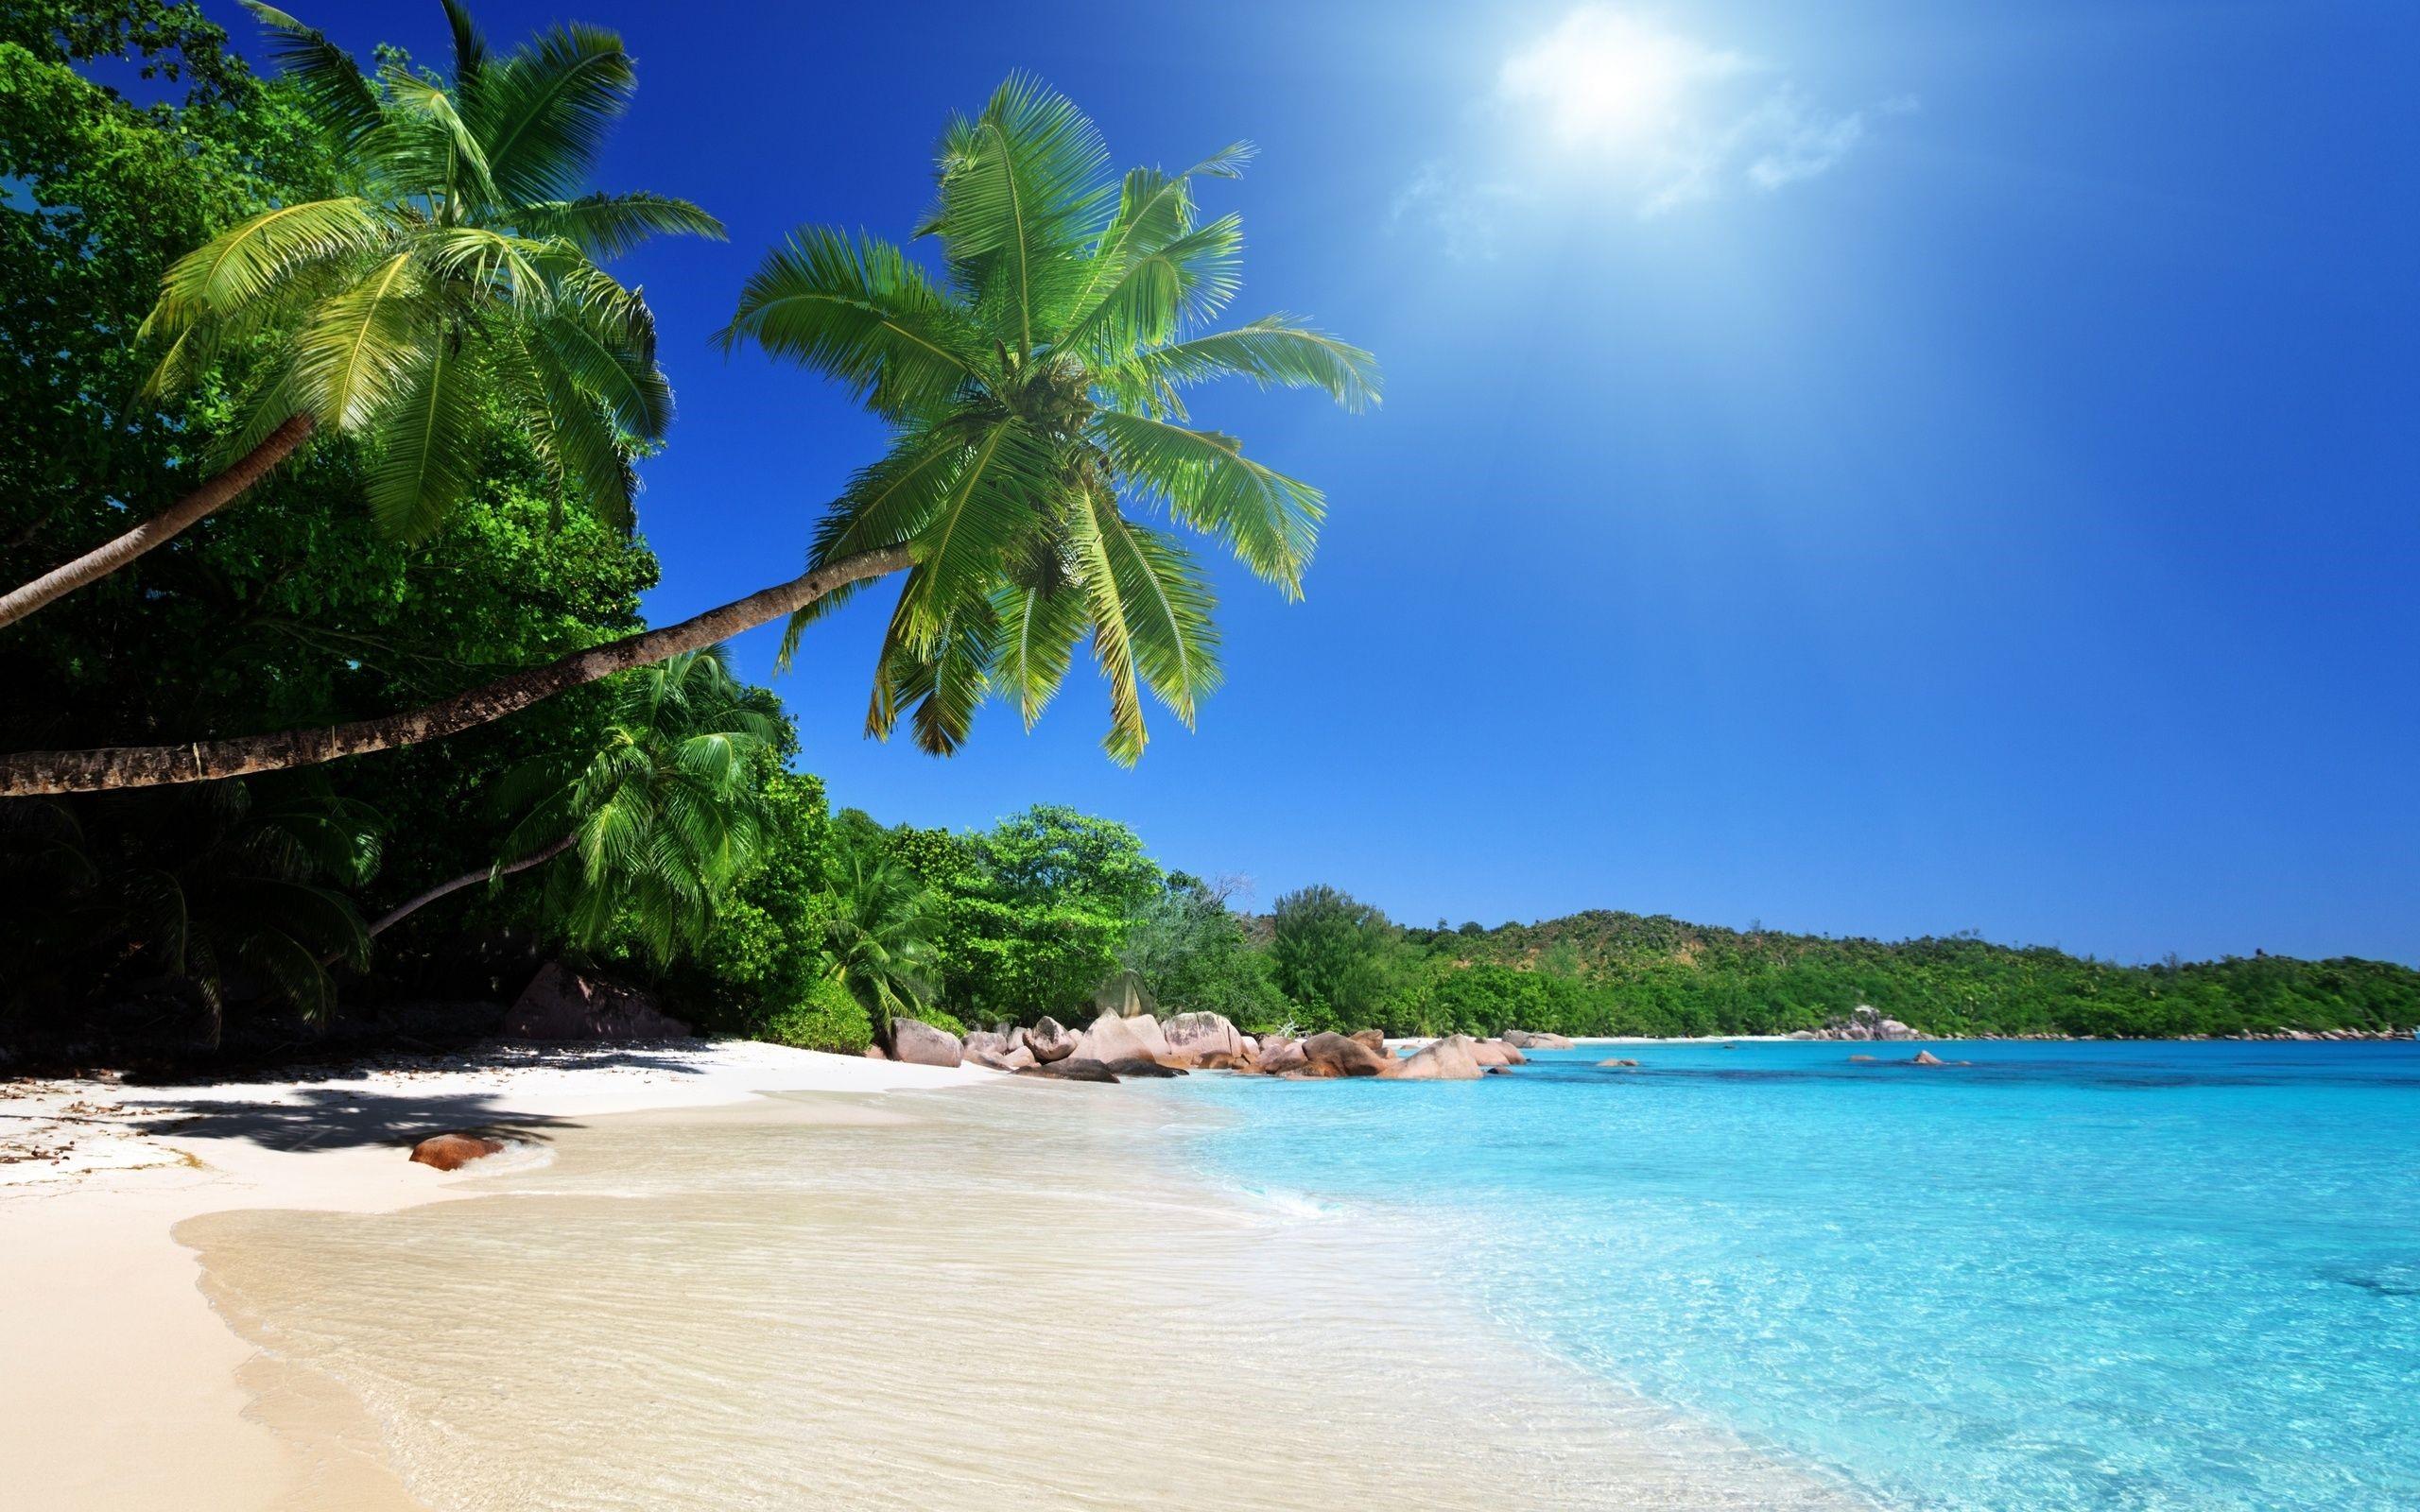 Tropical Beach Landscape 1080p Wallpapers